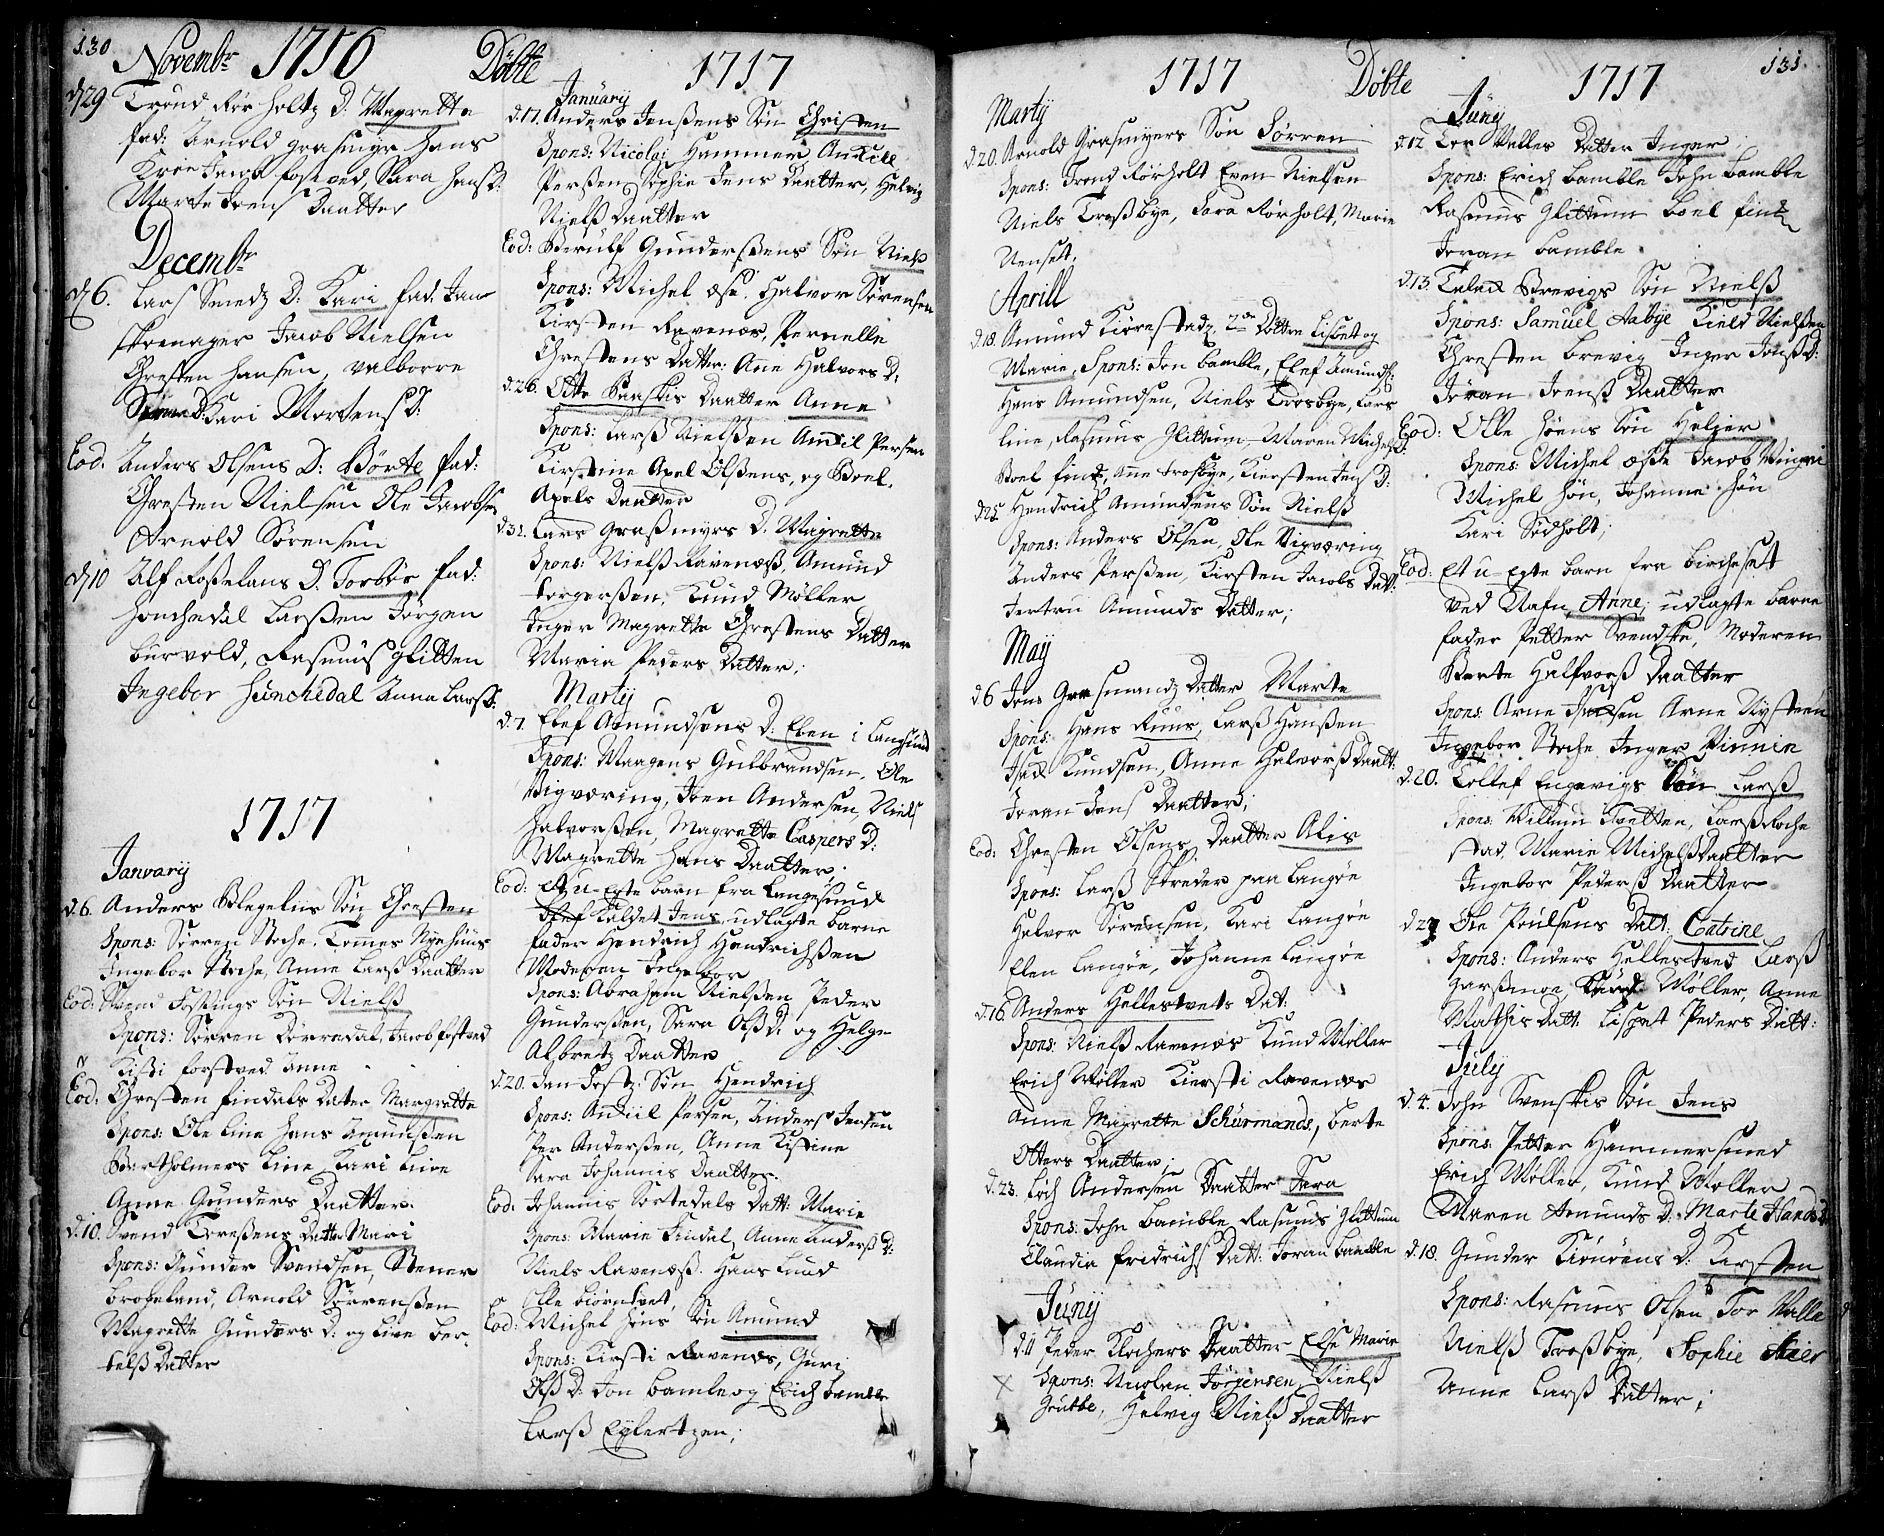 SAKO, Bamble kirkebøker, F/Fa/L0001: Ministerialbok nr. I 1, 1702-1774, s. 130-131